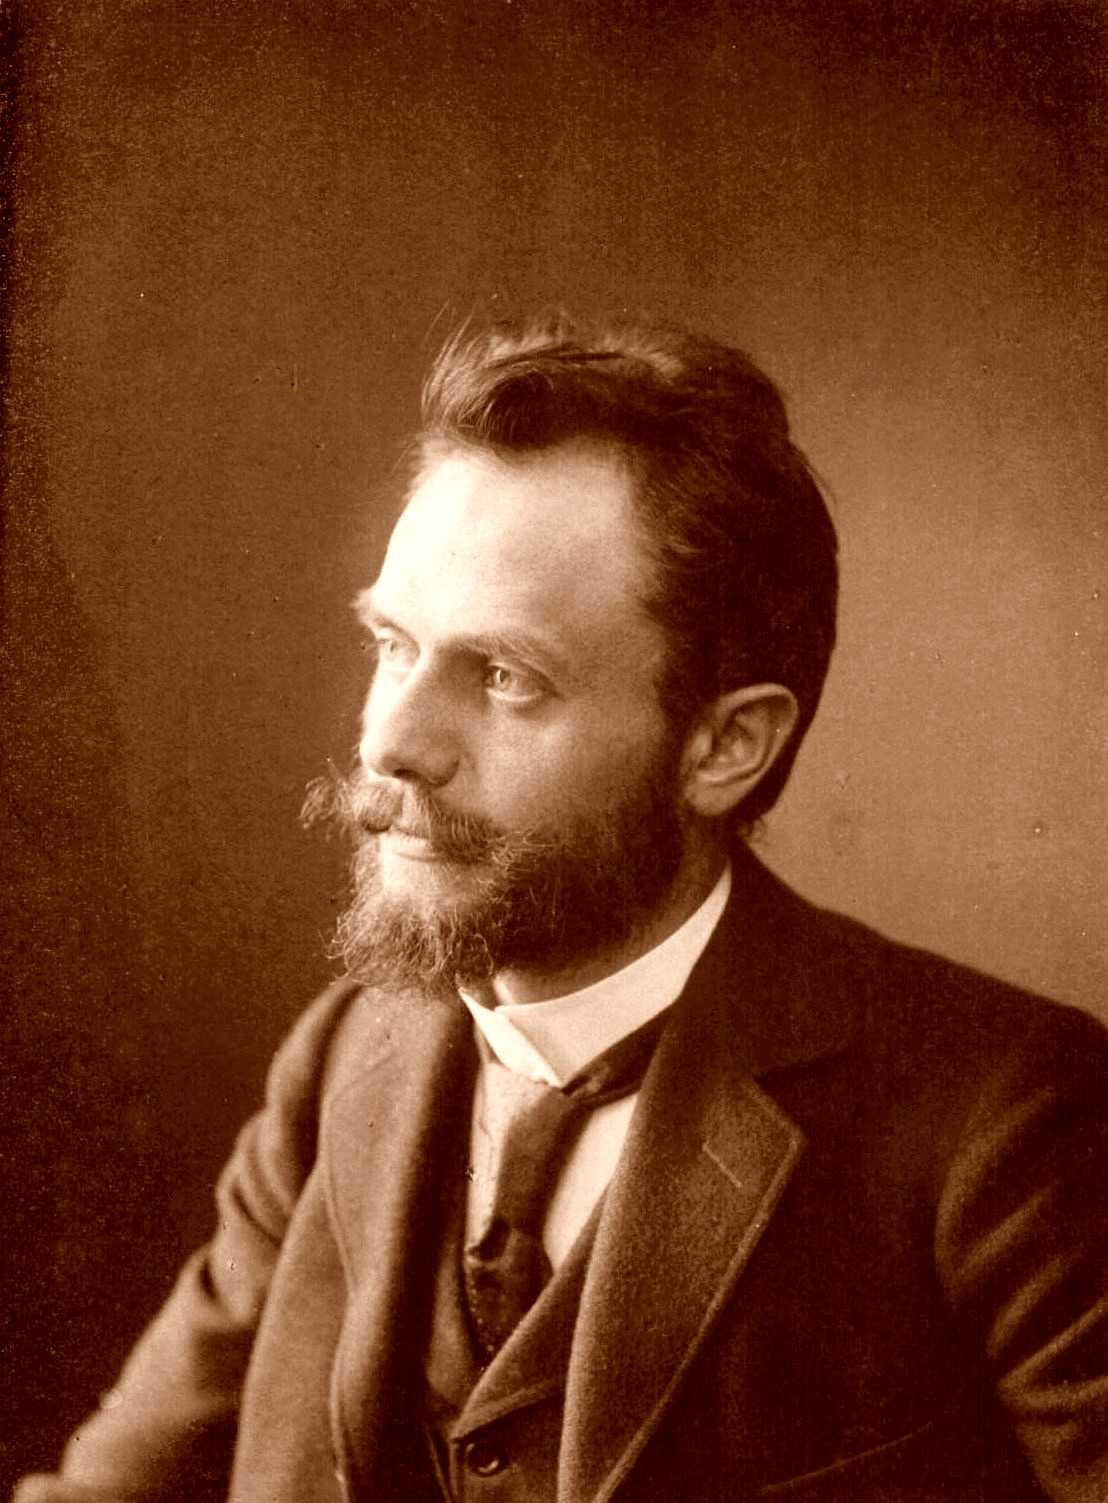 Wilhelm Spohr fotografiado por Wettern en Hamburgo (ca. 1890 a 1910)